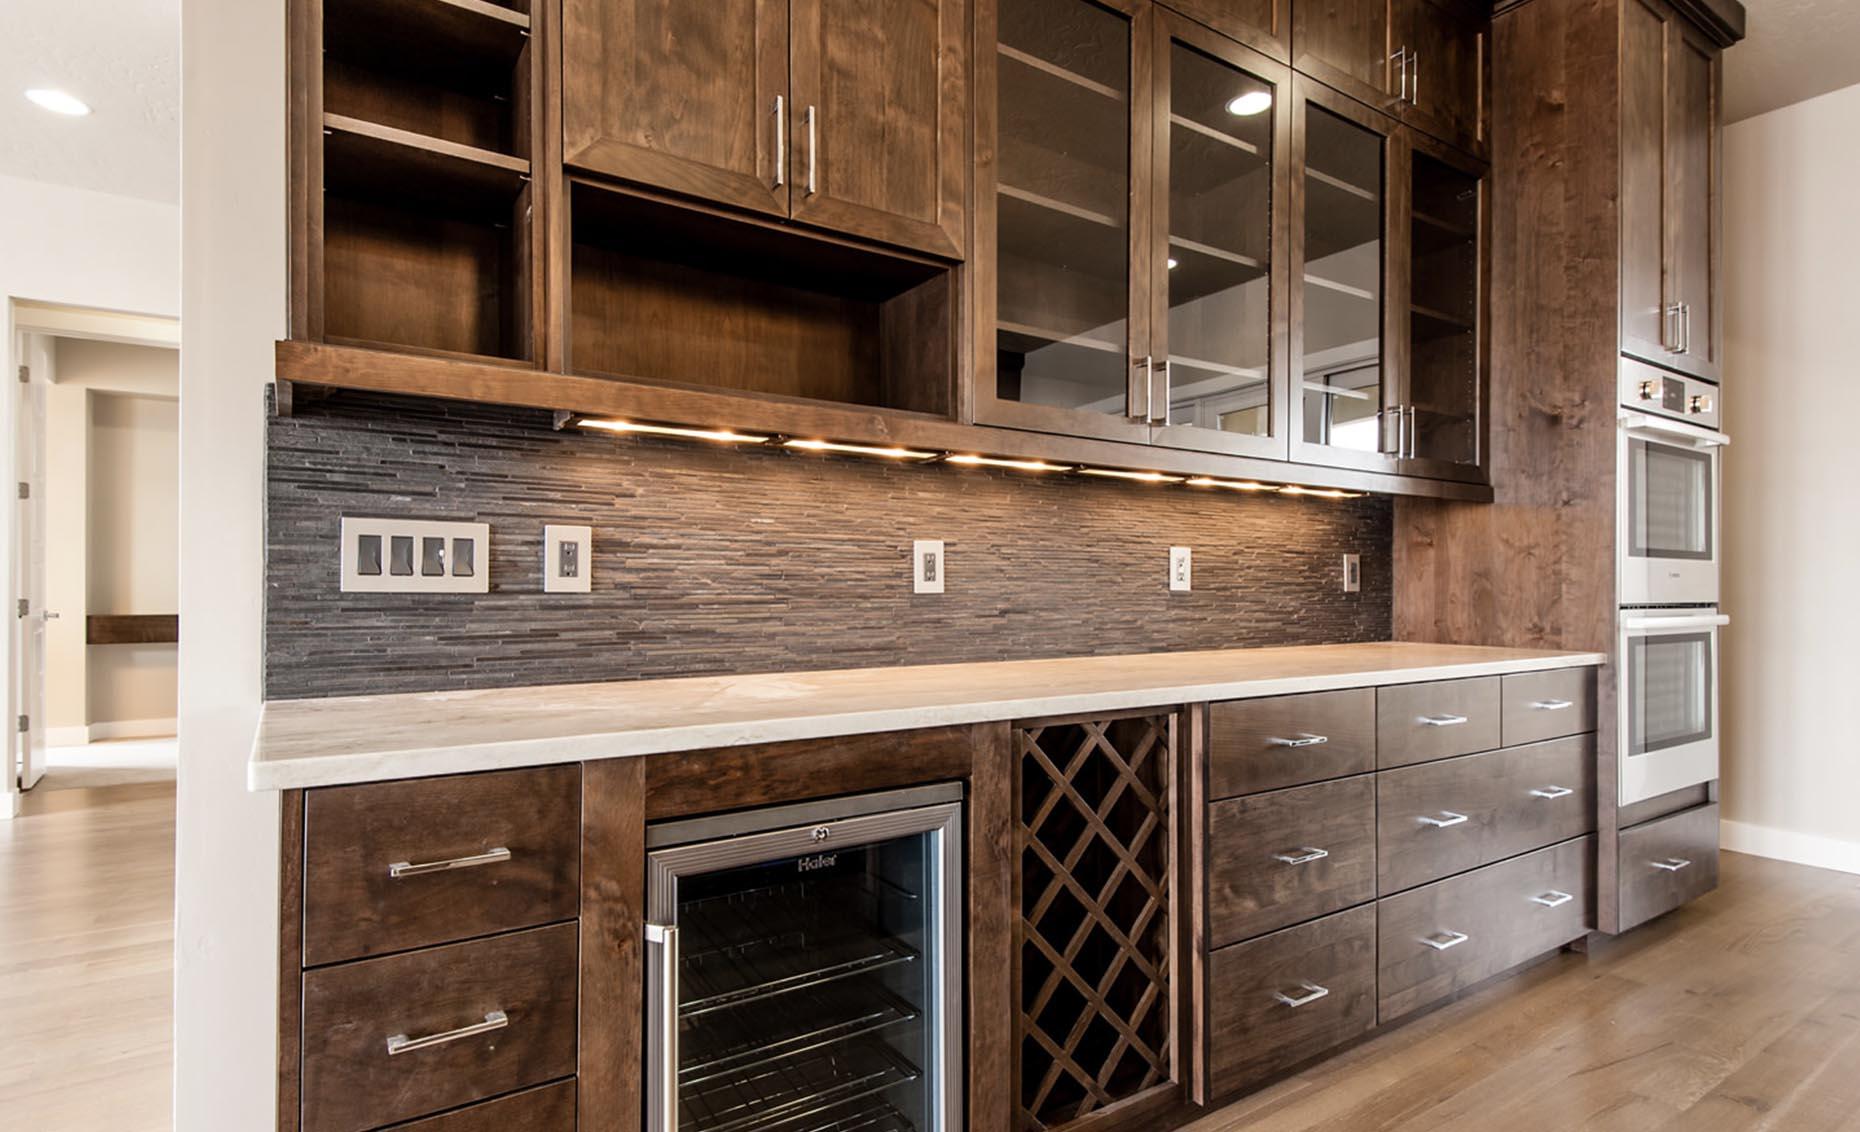 The Corrente Bello House Kitchen Counter and Storage